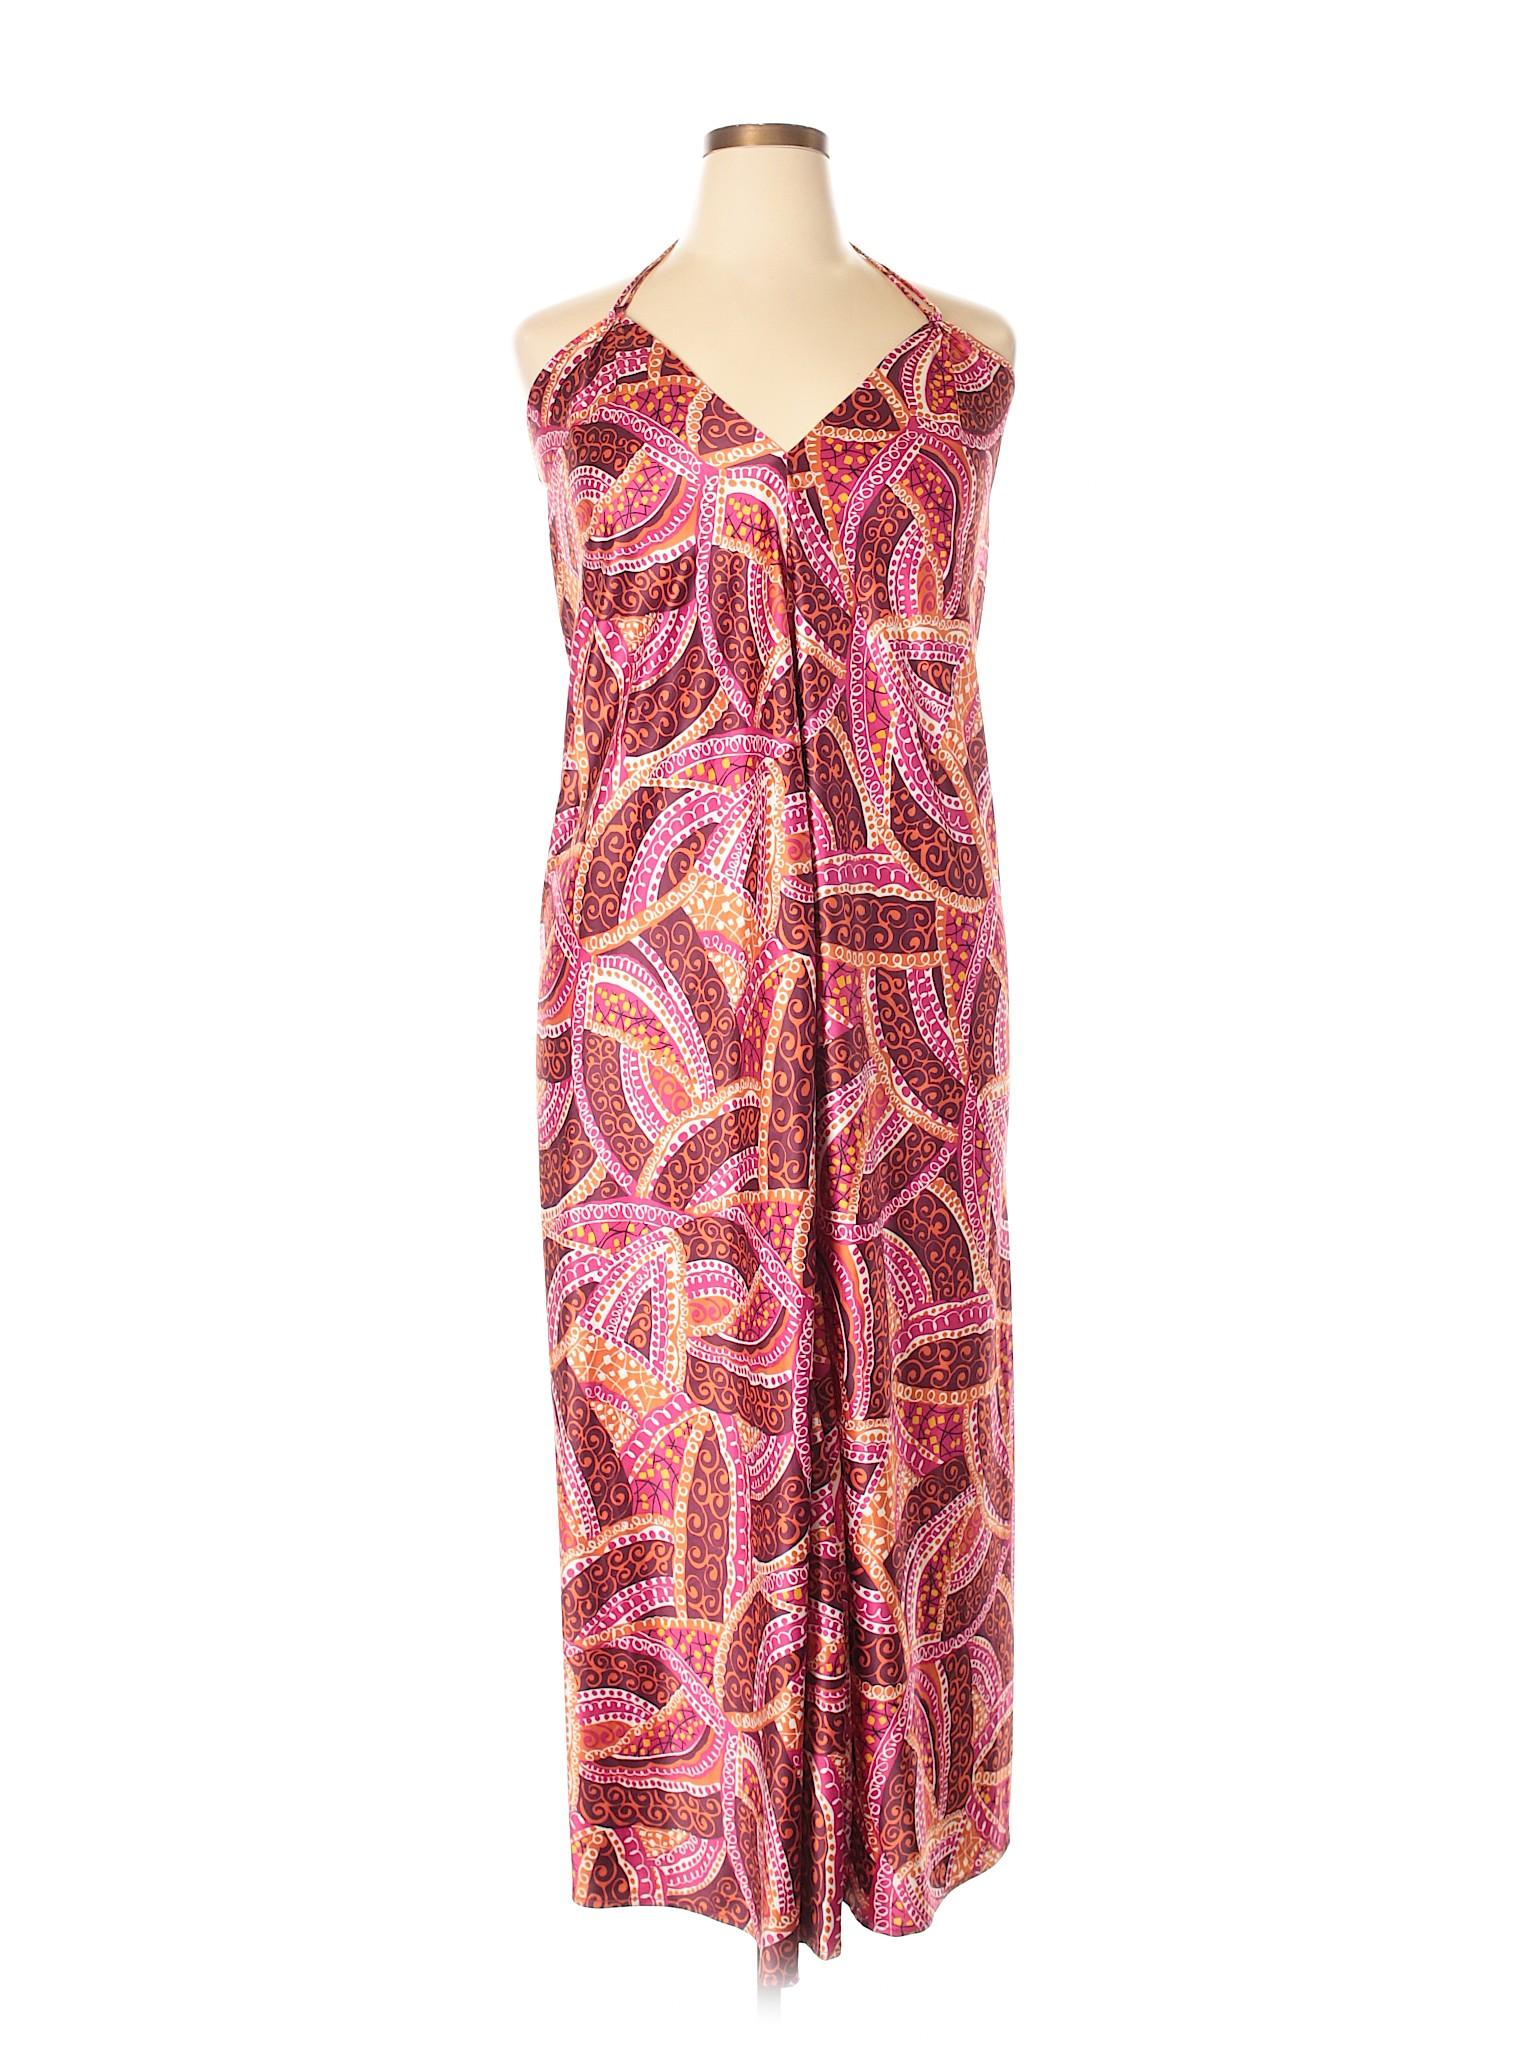 Company Boutique York amp; New Winter Casual Dress xaaqIP